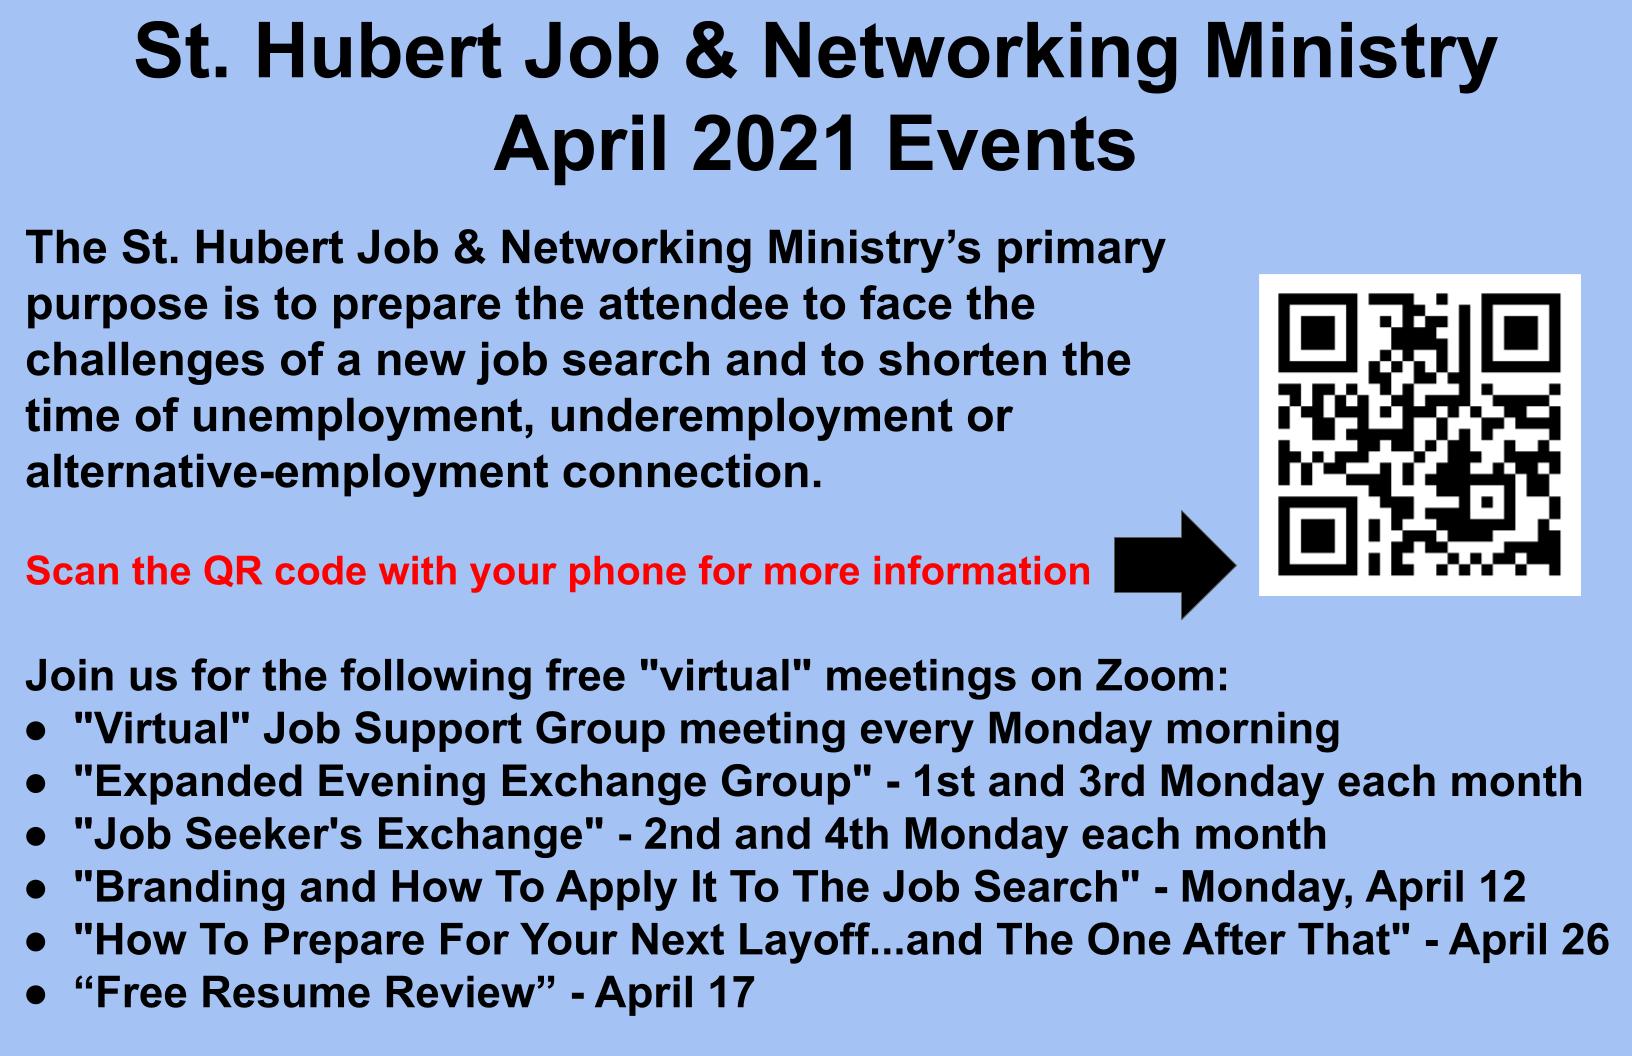 st-hubert-job-networking-ministry-april-2021-events-barrington-library-advertisement